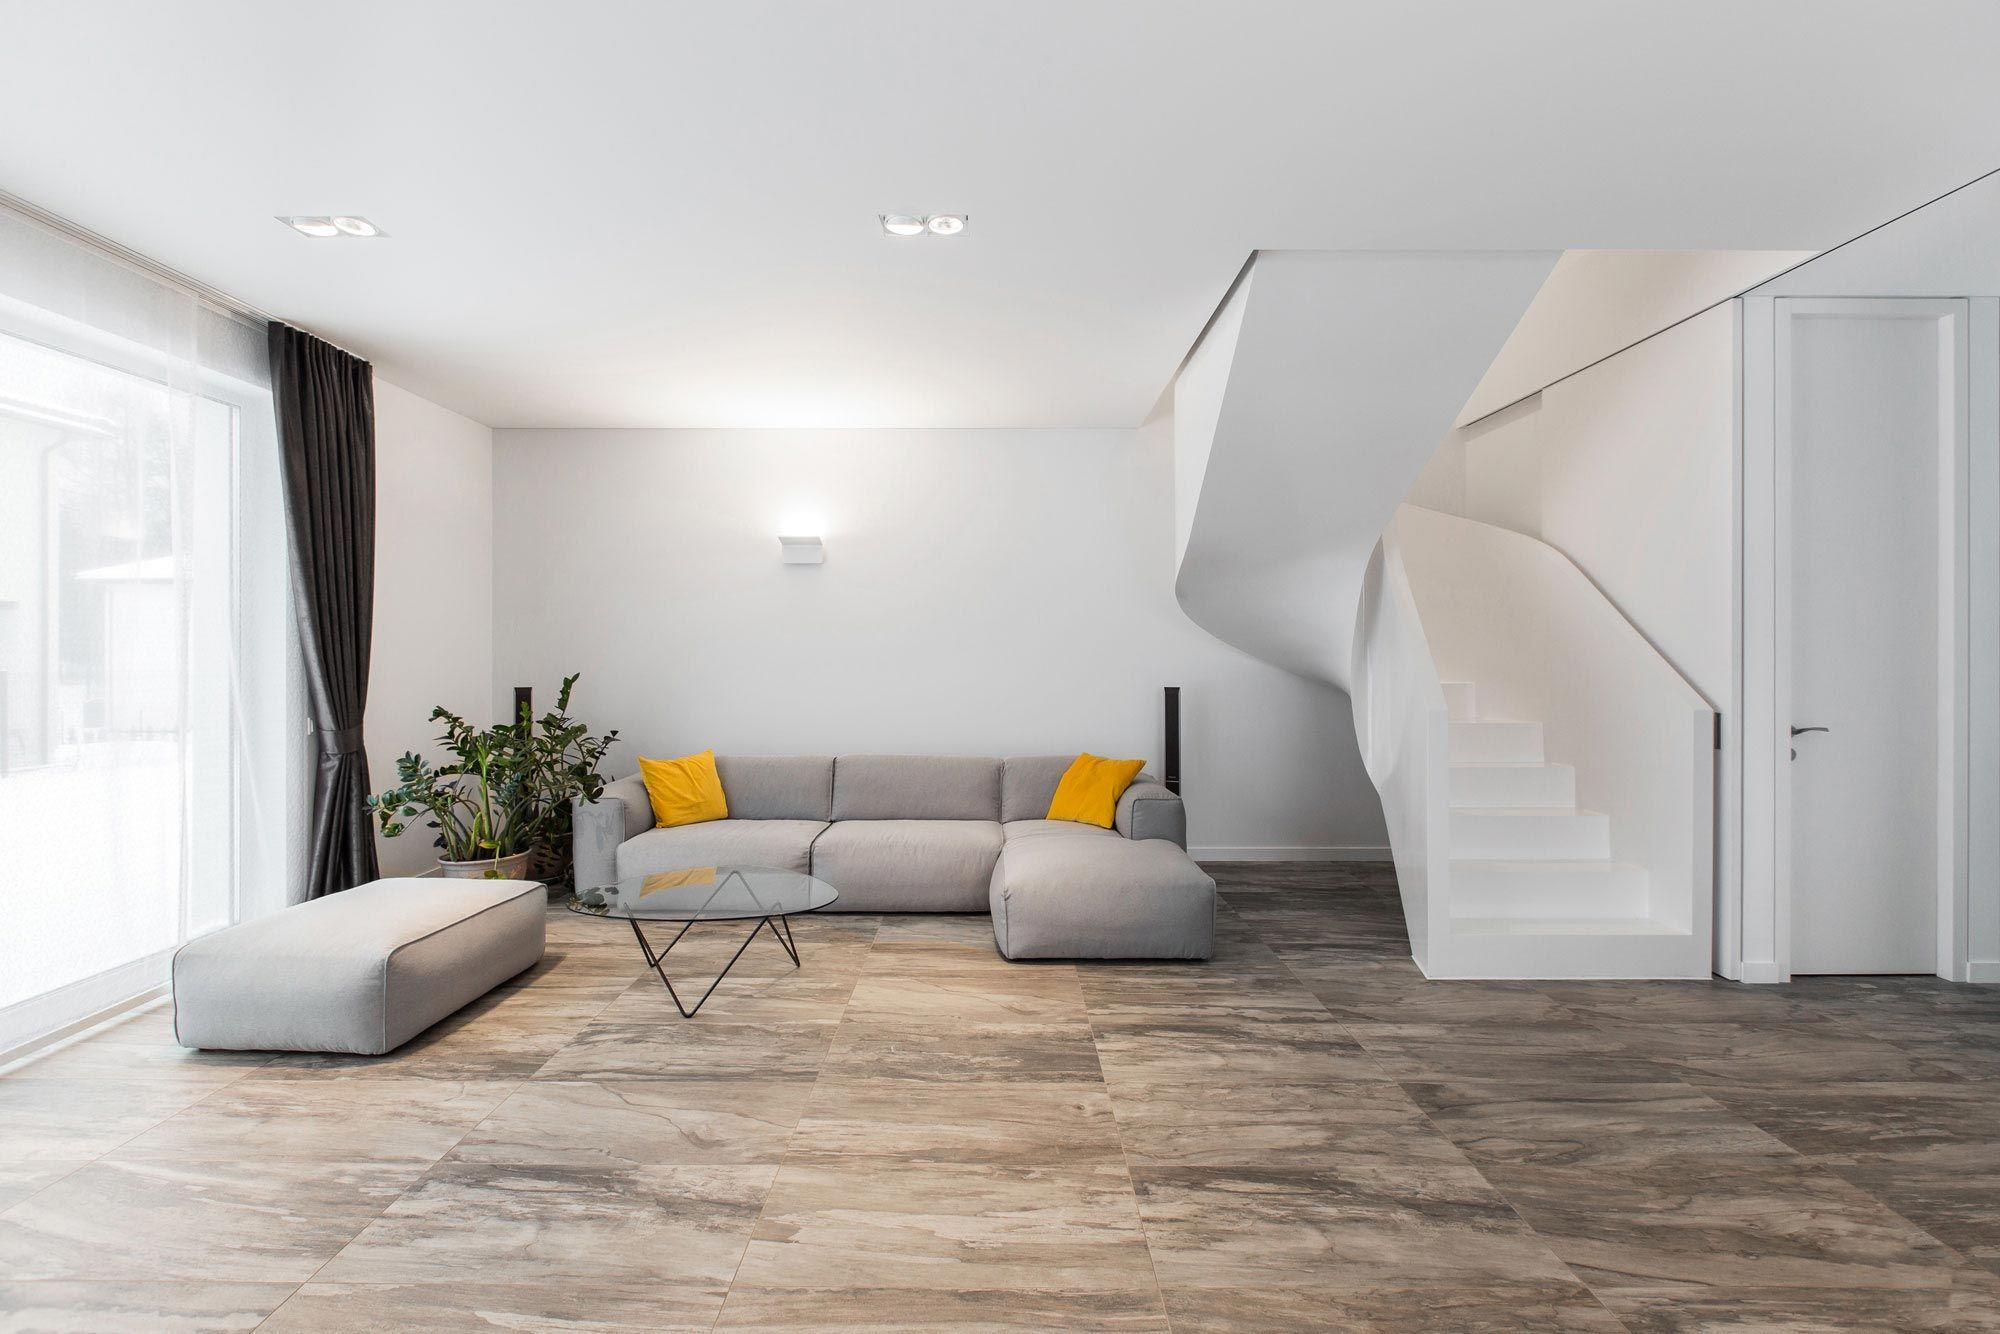 Minimalist Apartments pavilny minimalist houseycl studio - caandesign | home ideas